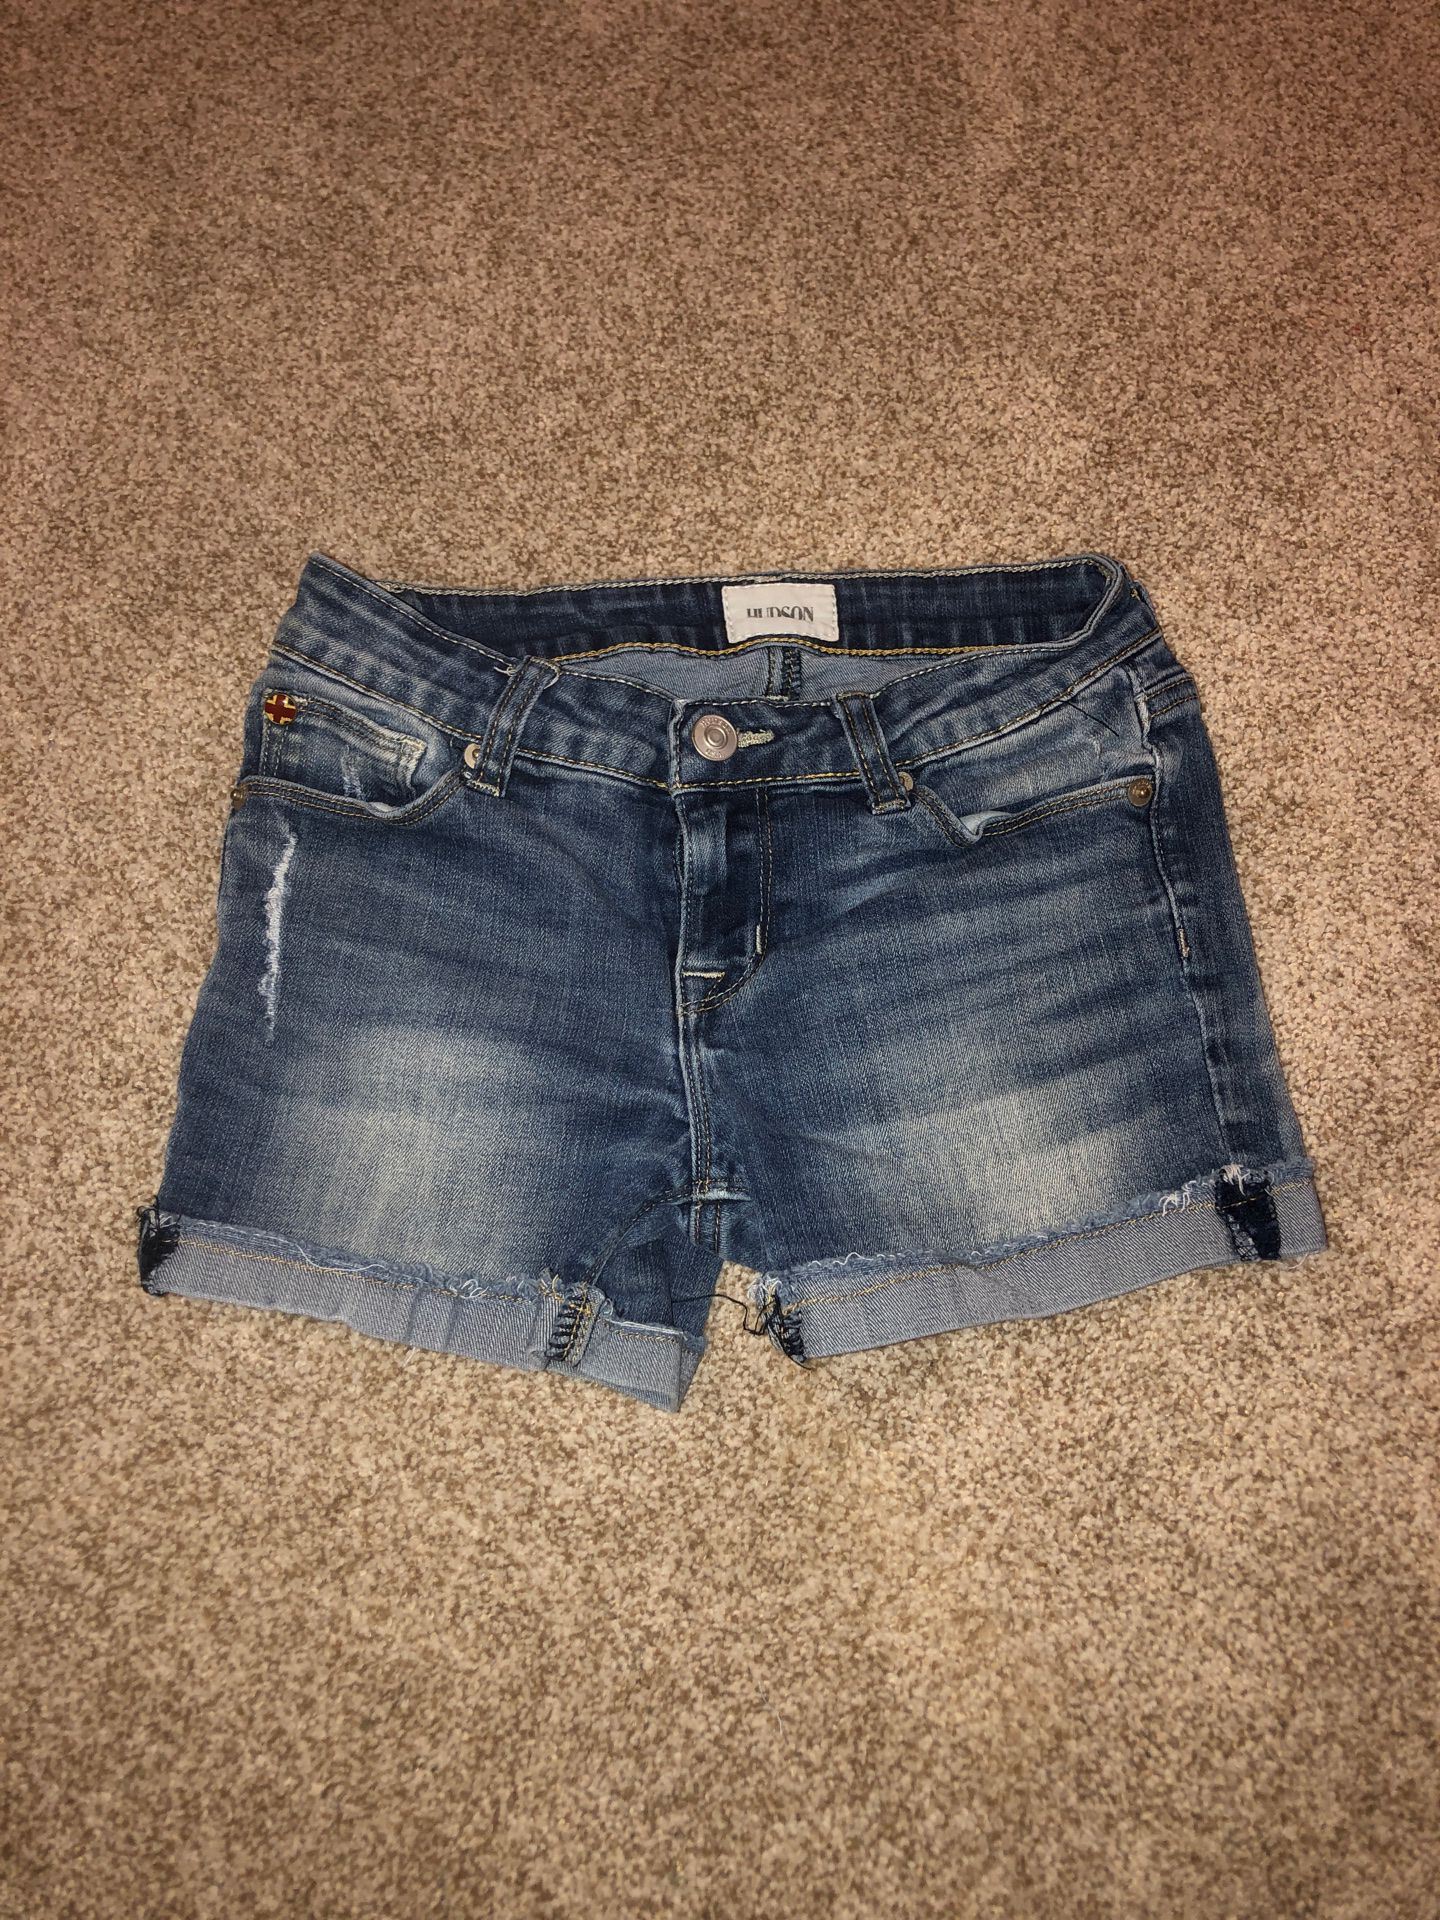 Hudson Girls Denim shorts size 12